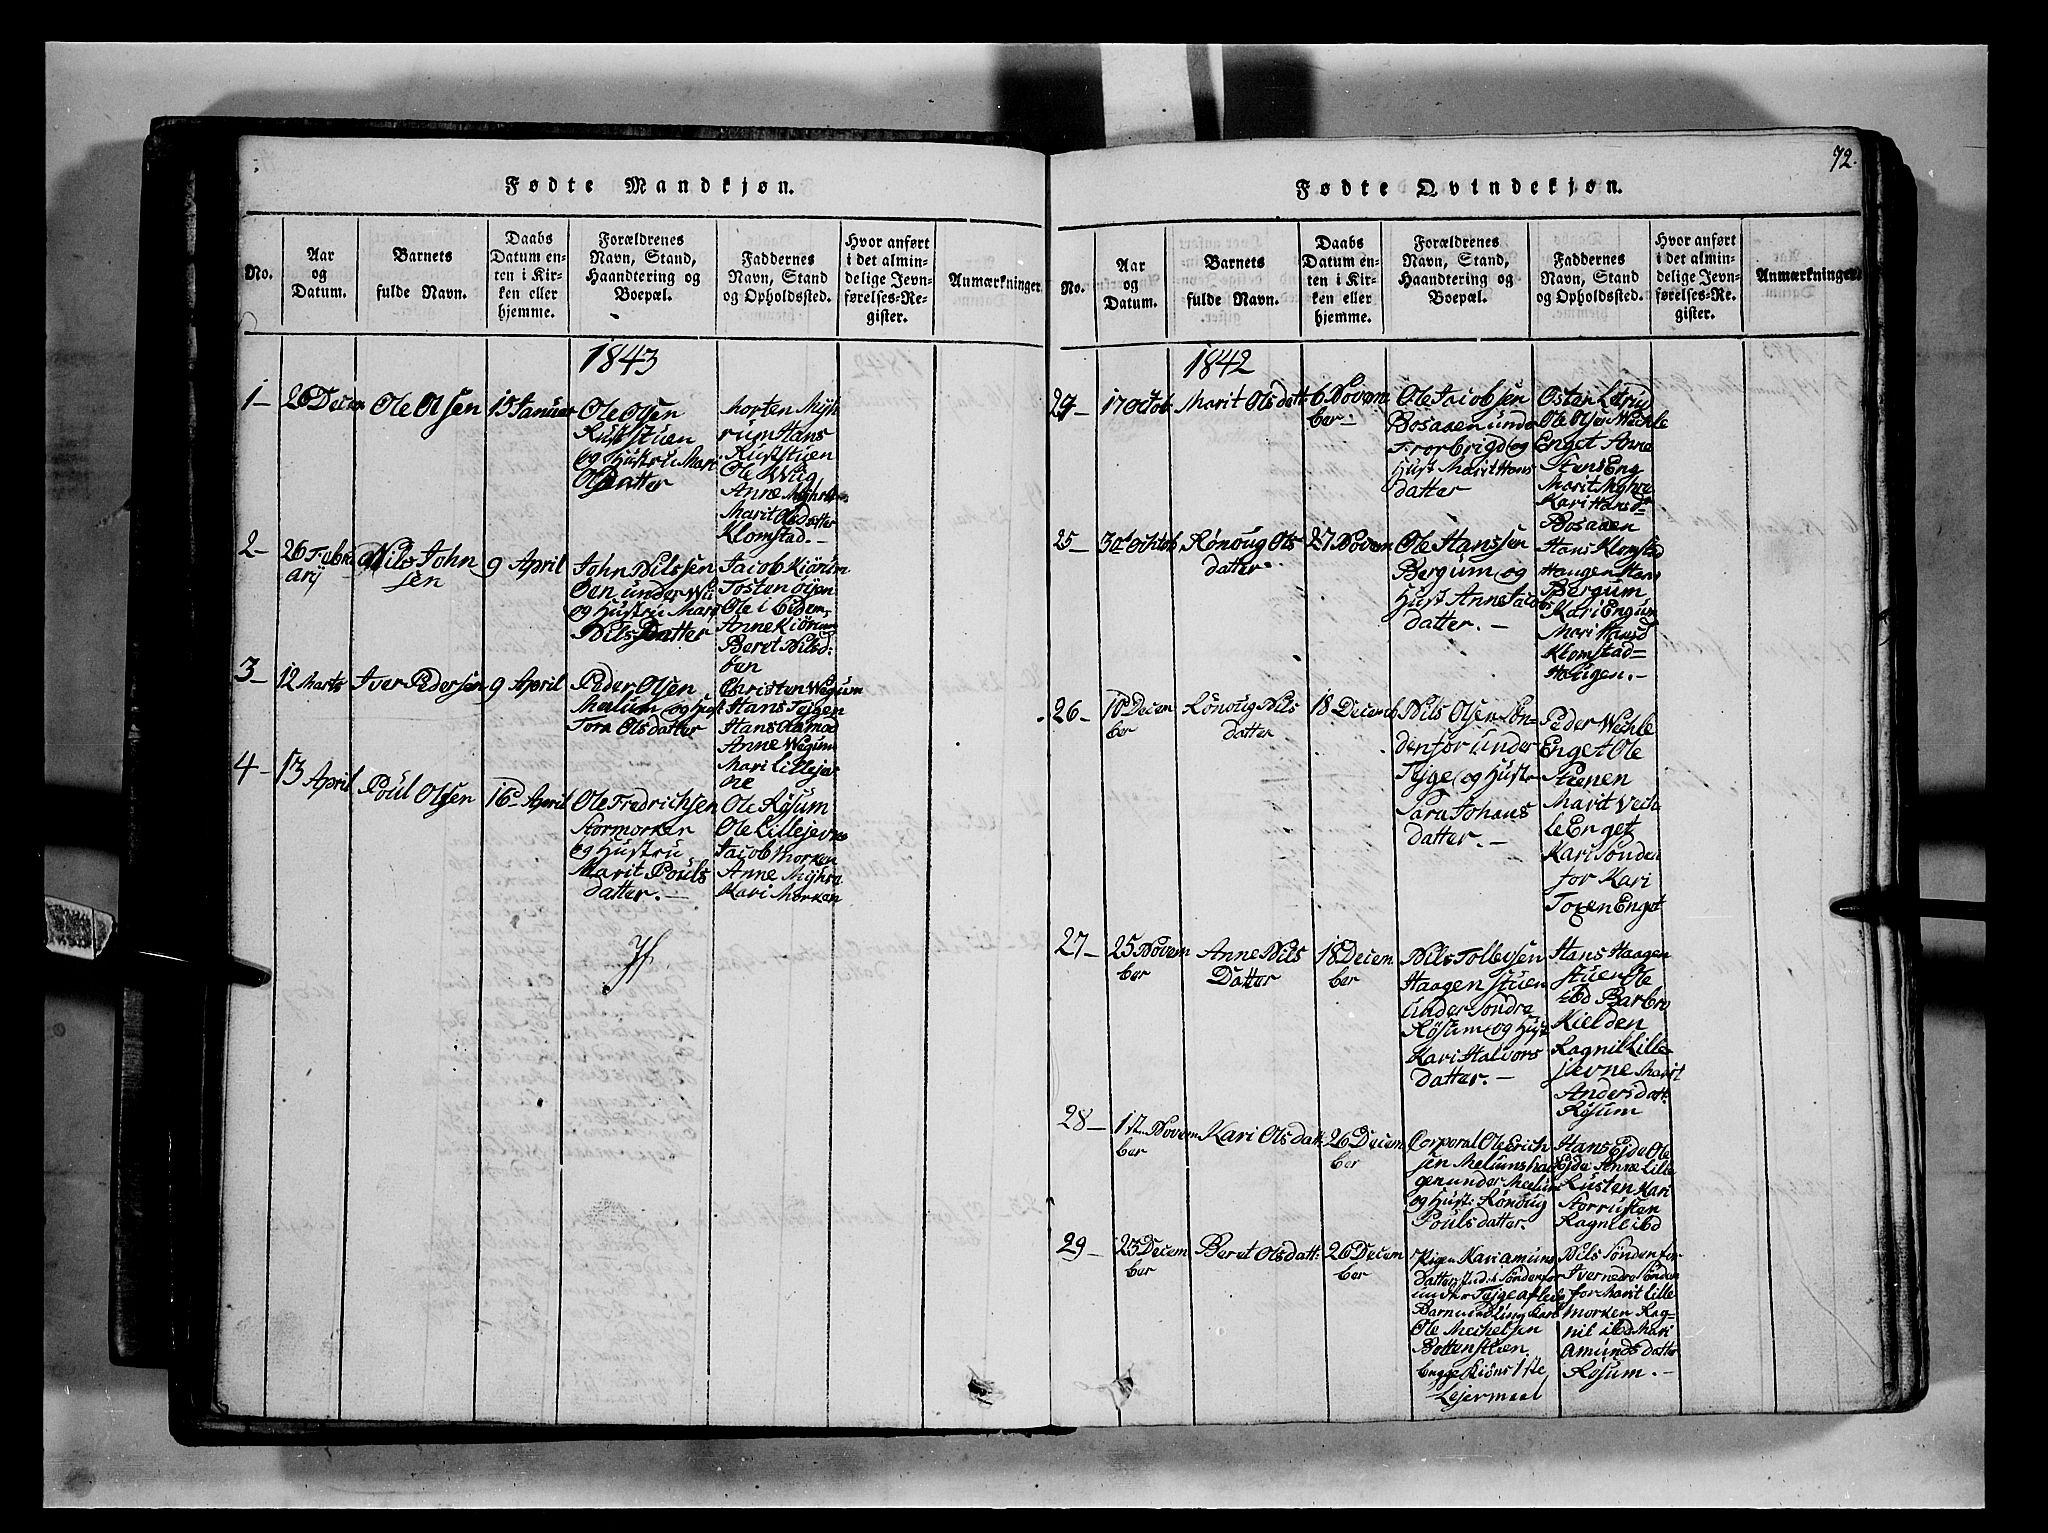 SAH, Fron prestekontor, H/Ha/Hab/L0002: Klokkerbok nr. 2, 1816-1850, s. 72